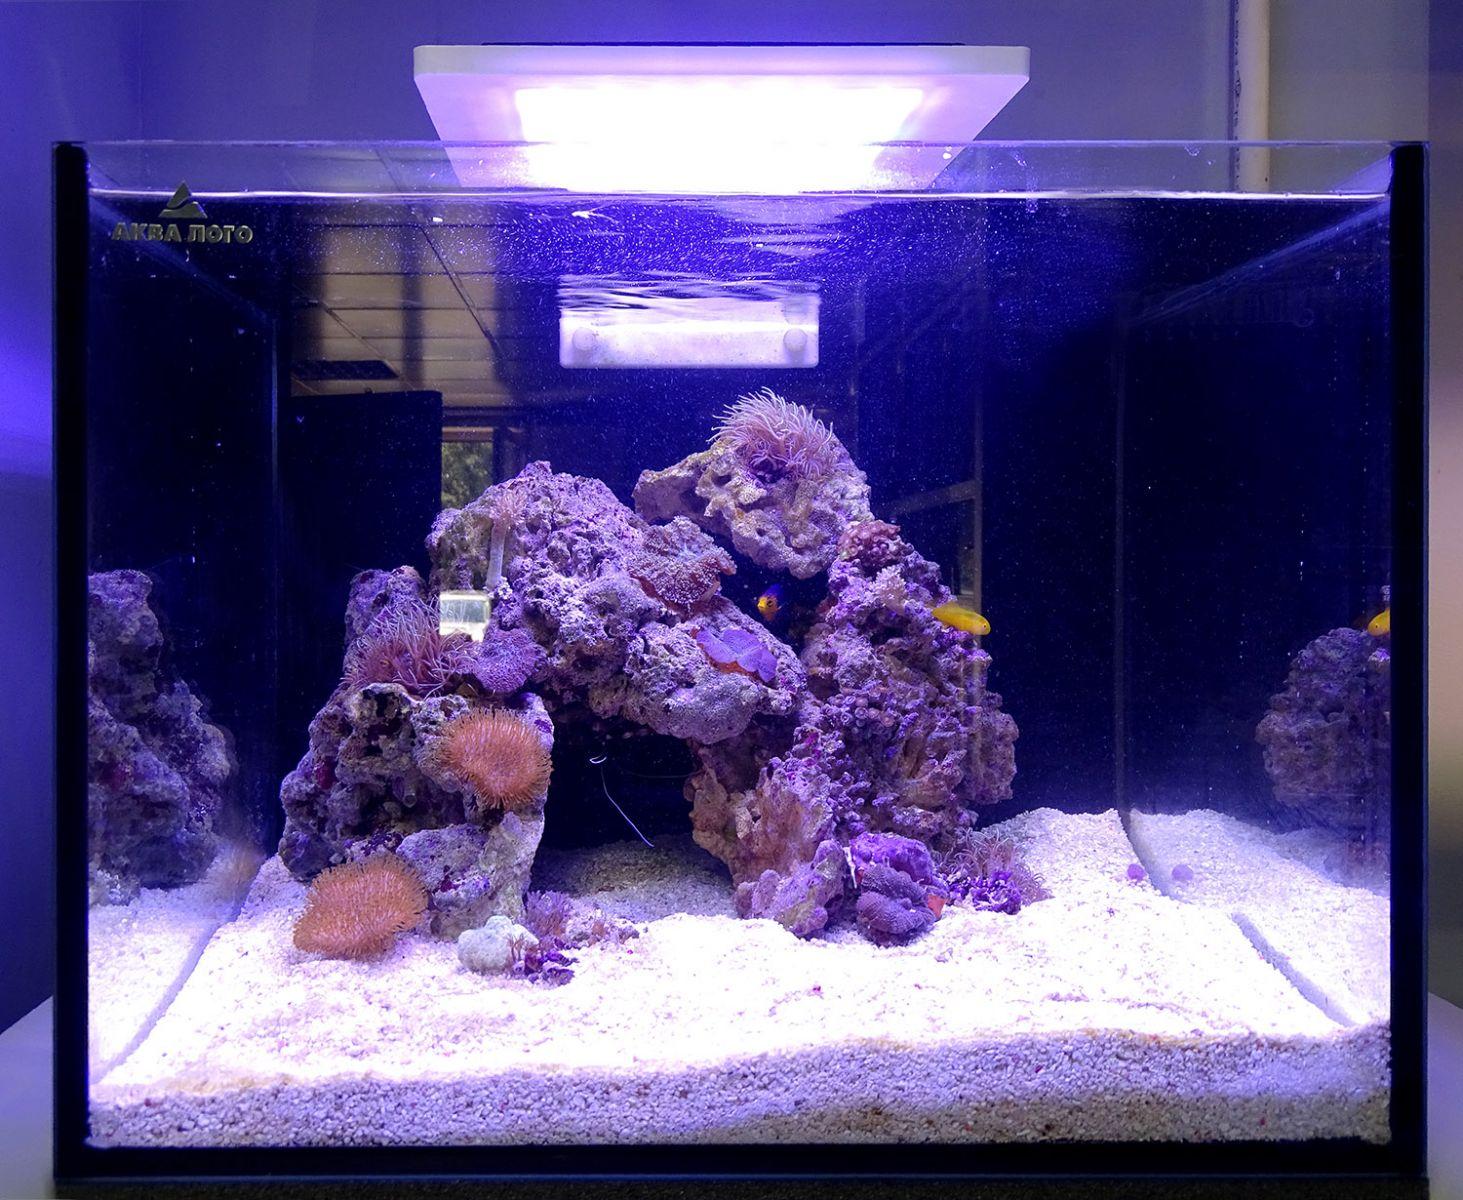 Морской аквариум Ксения - готовое решение в супермаркете Аква Лого!